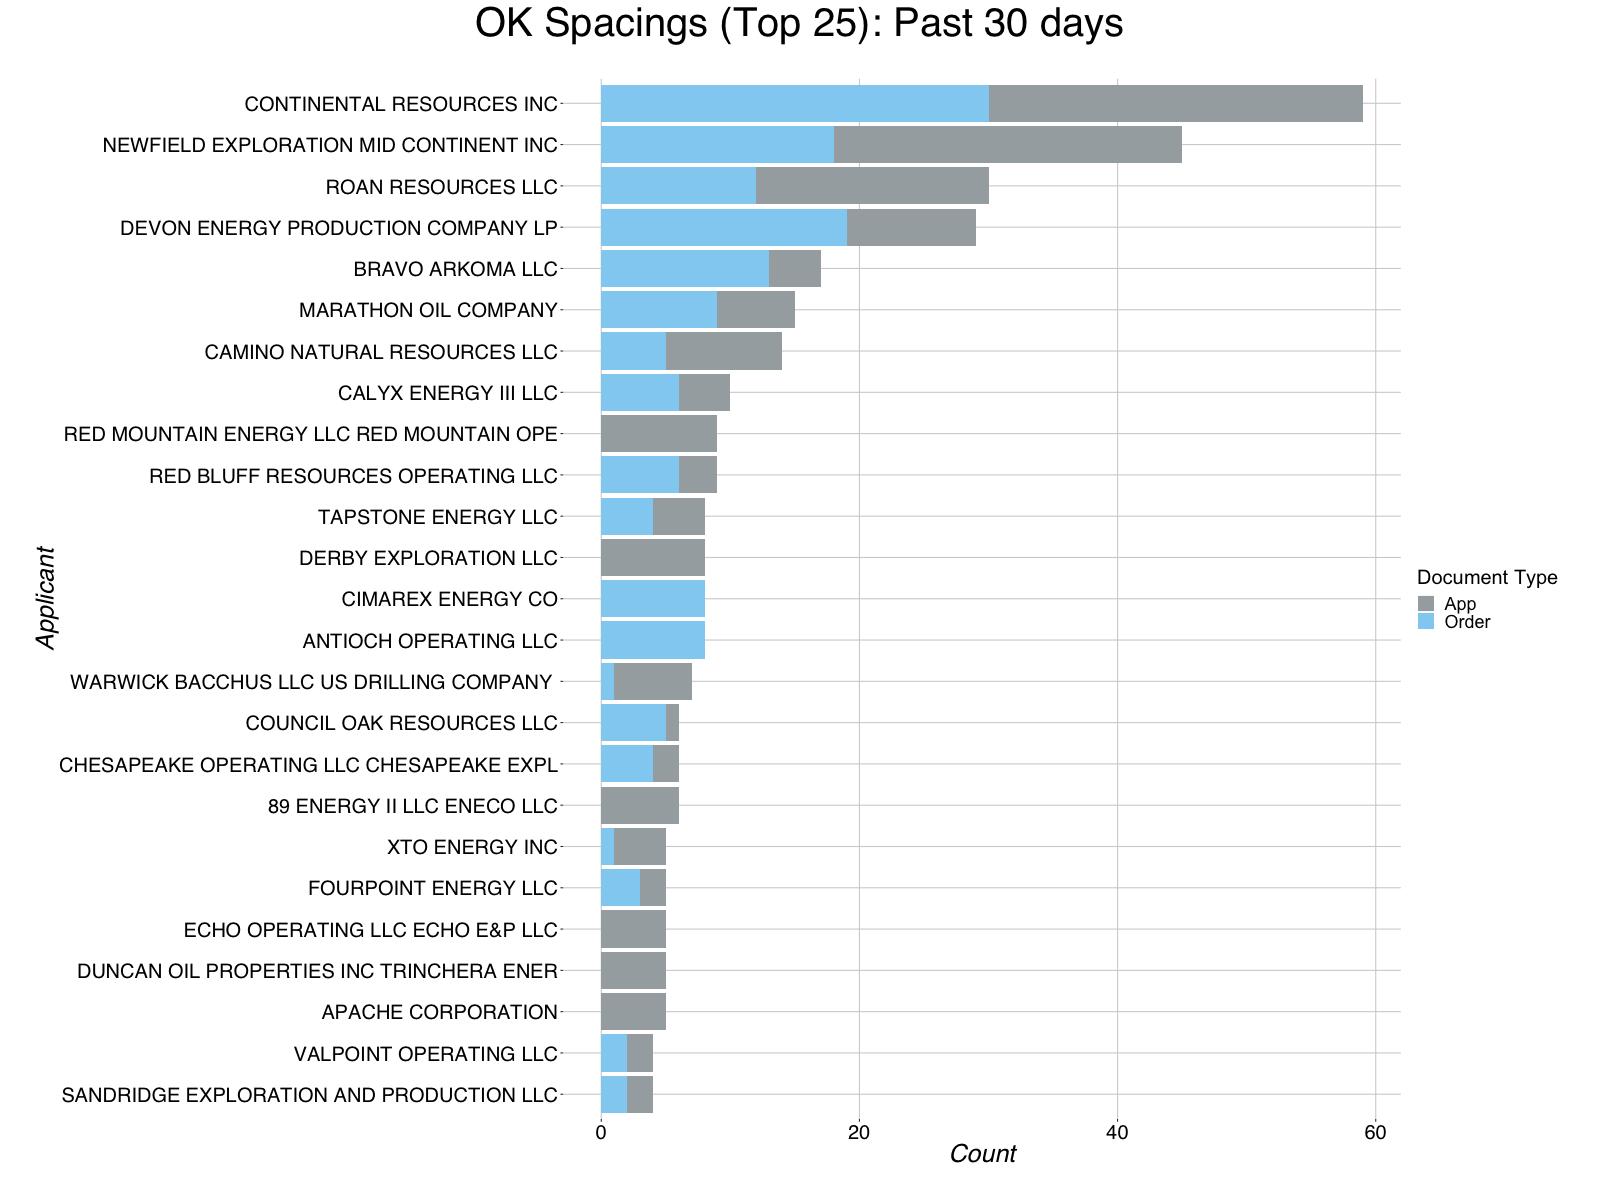 report_bar_chart_spacing_ok_email